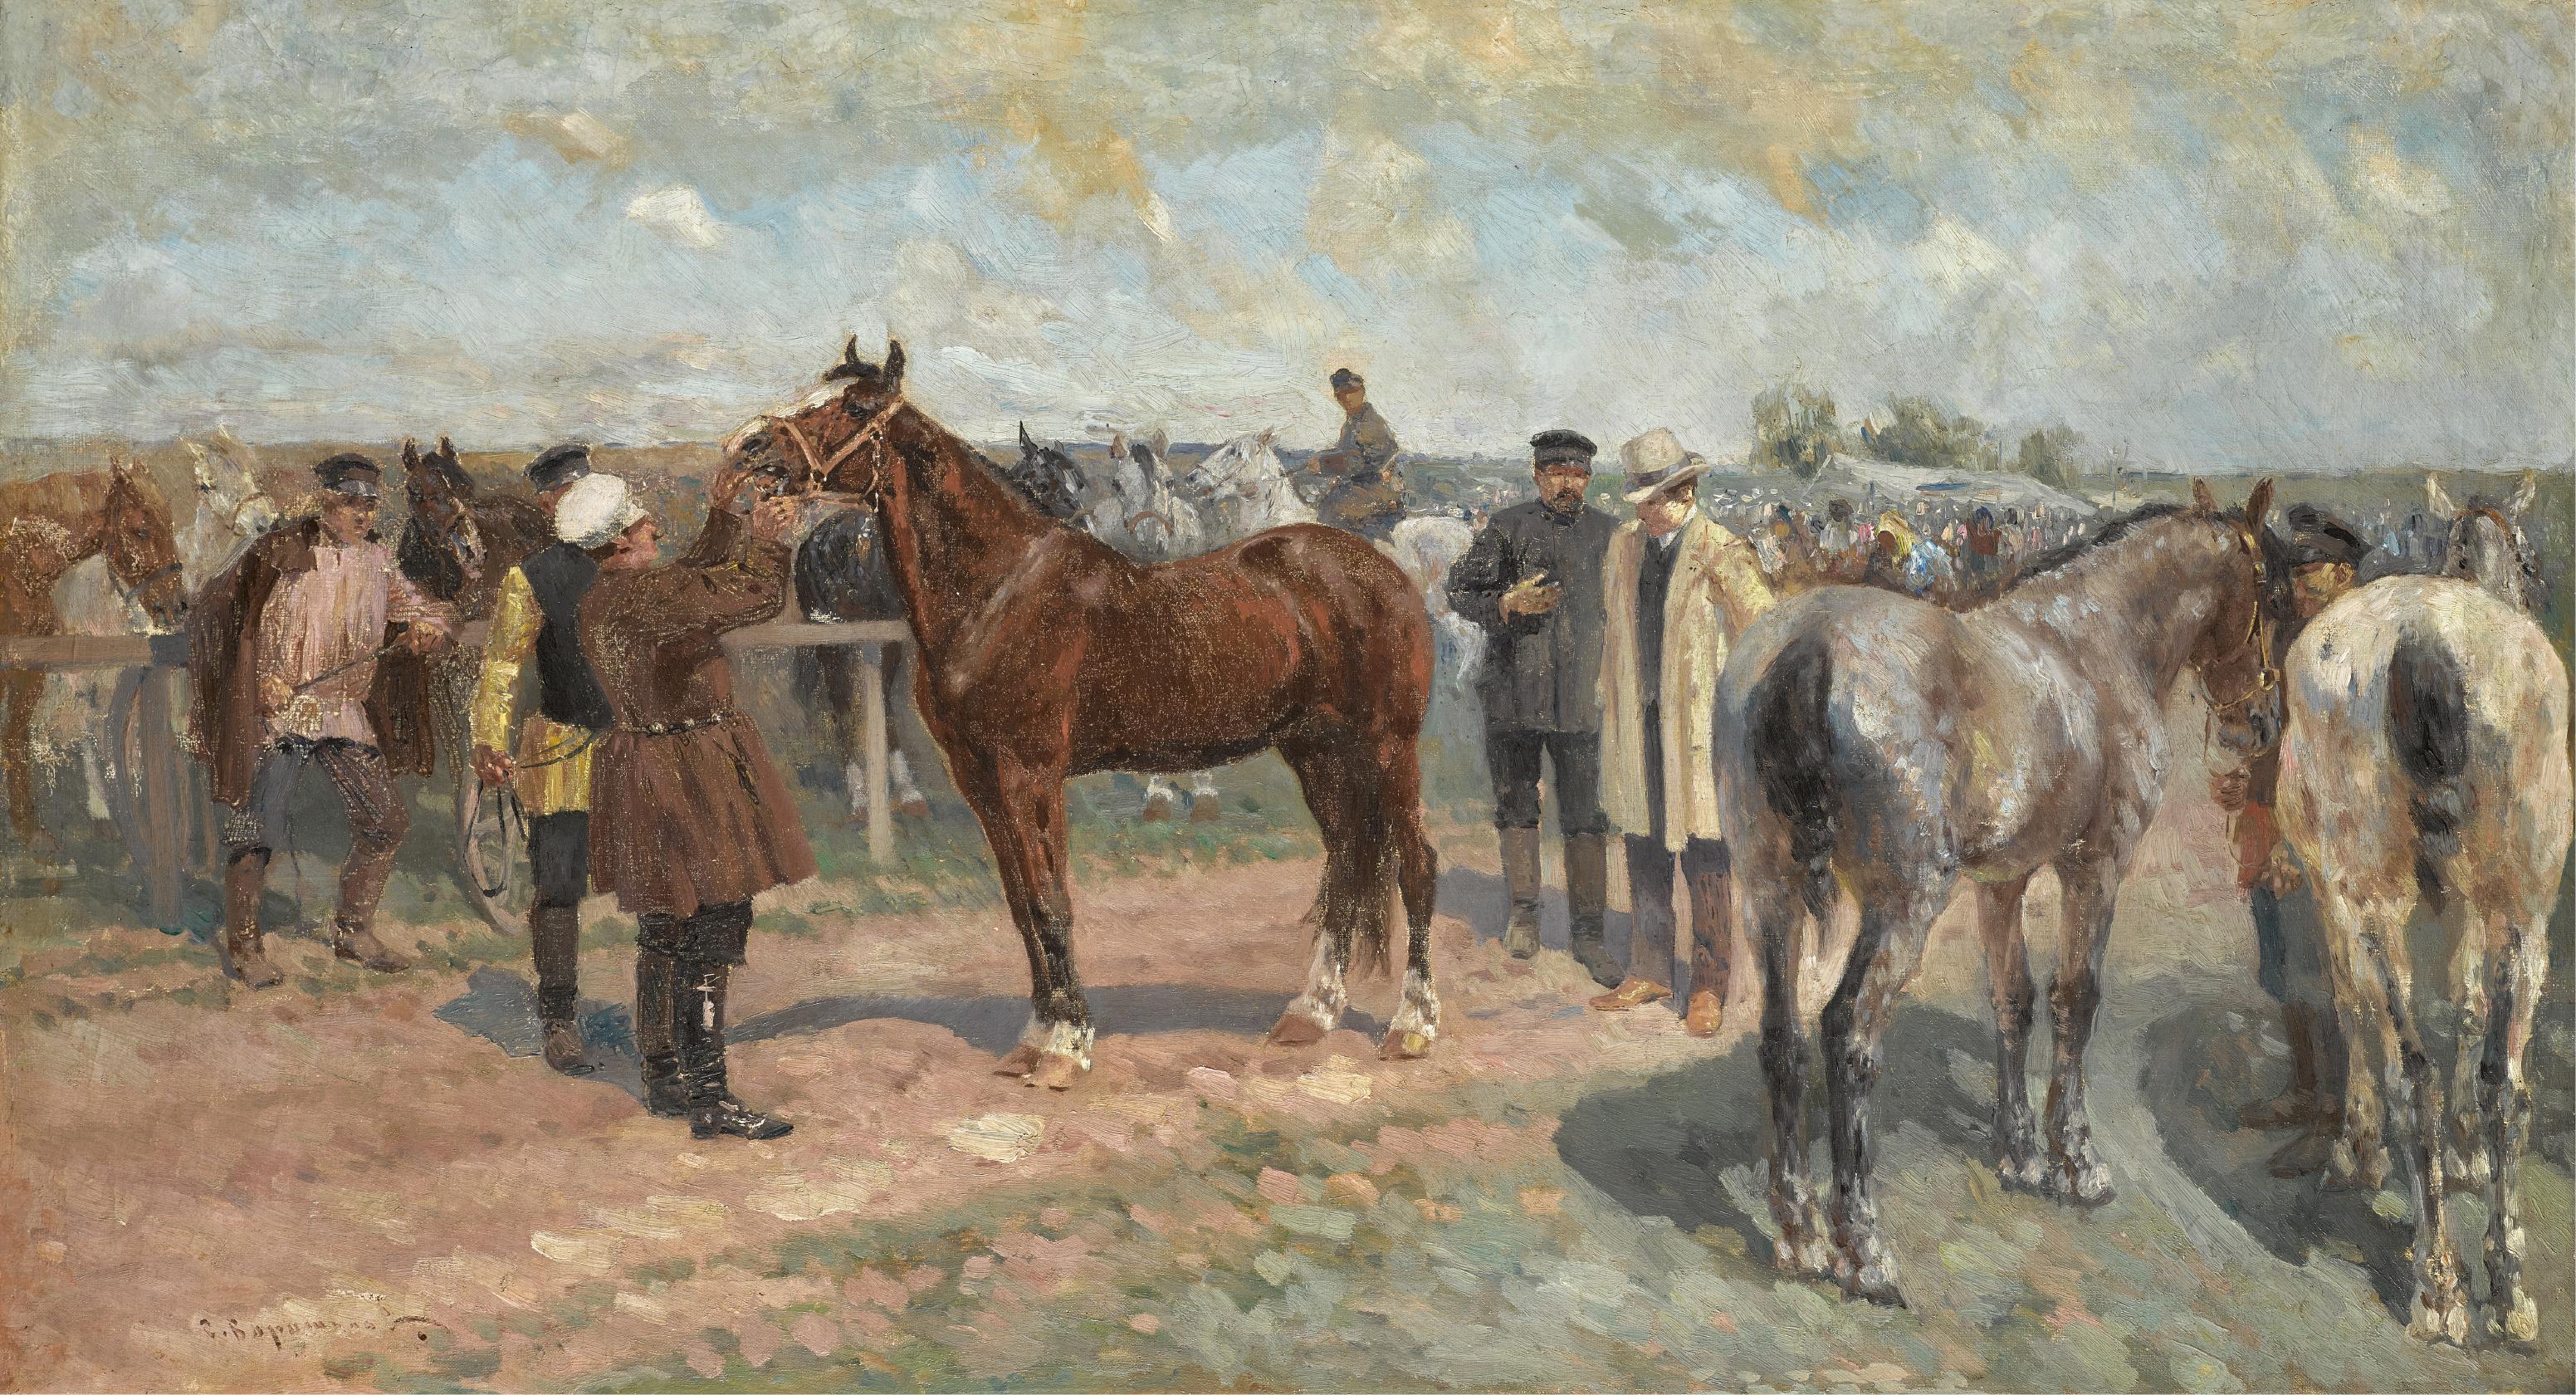 SERGEI SEMENOVICH VOROSHILOV | Horse Fair